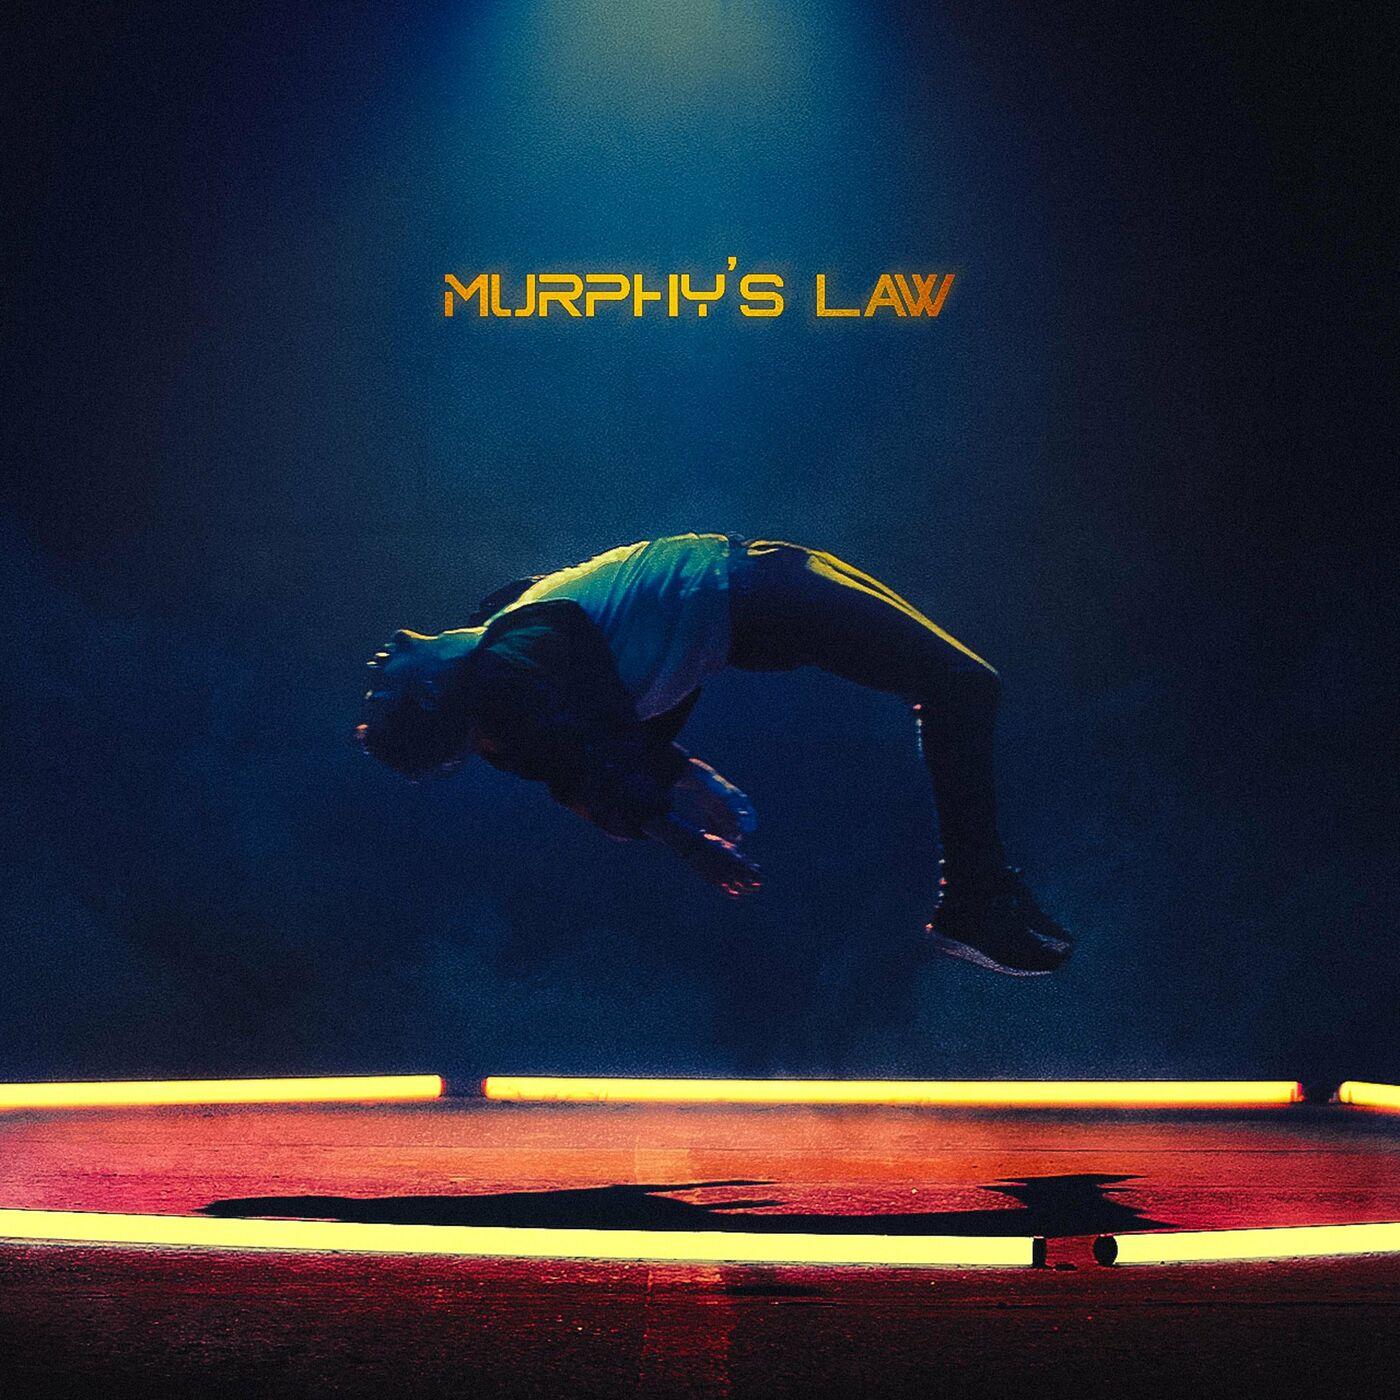 Suasion - Murphy's Law [single] (2021)